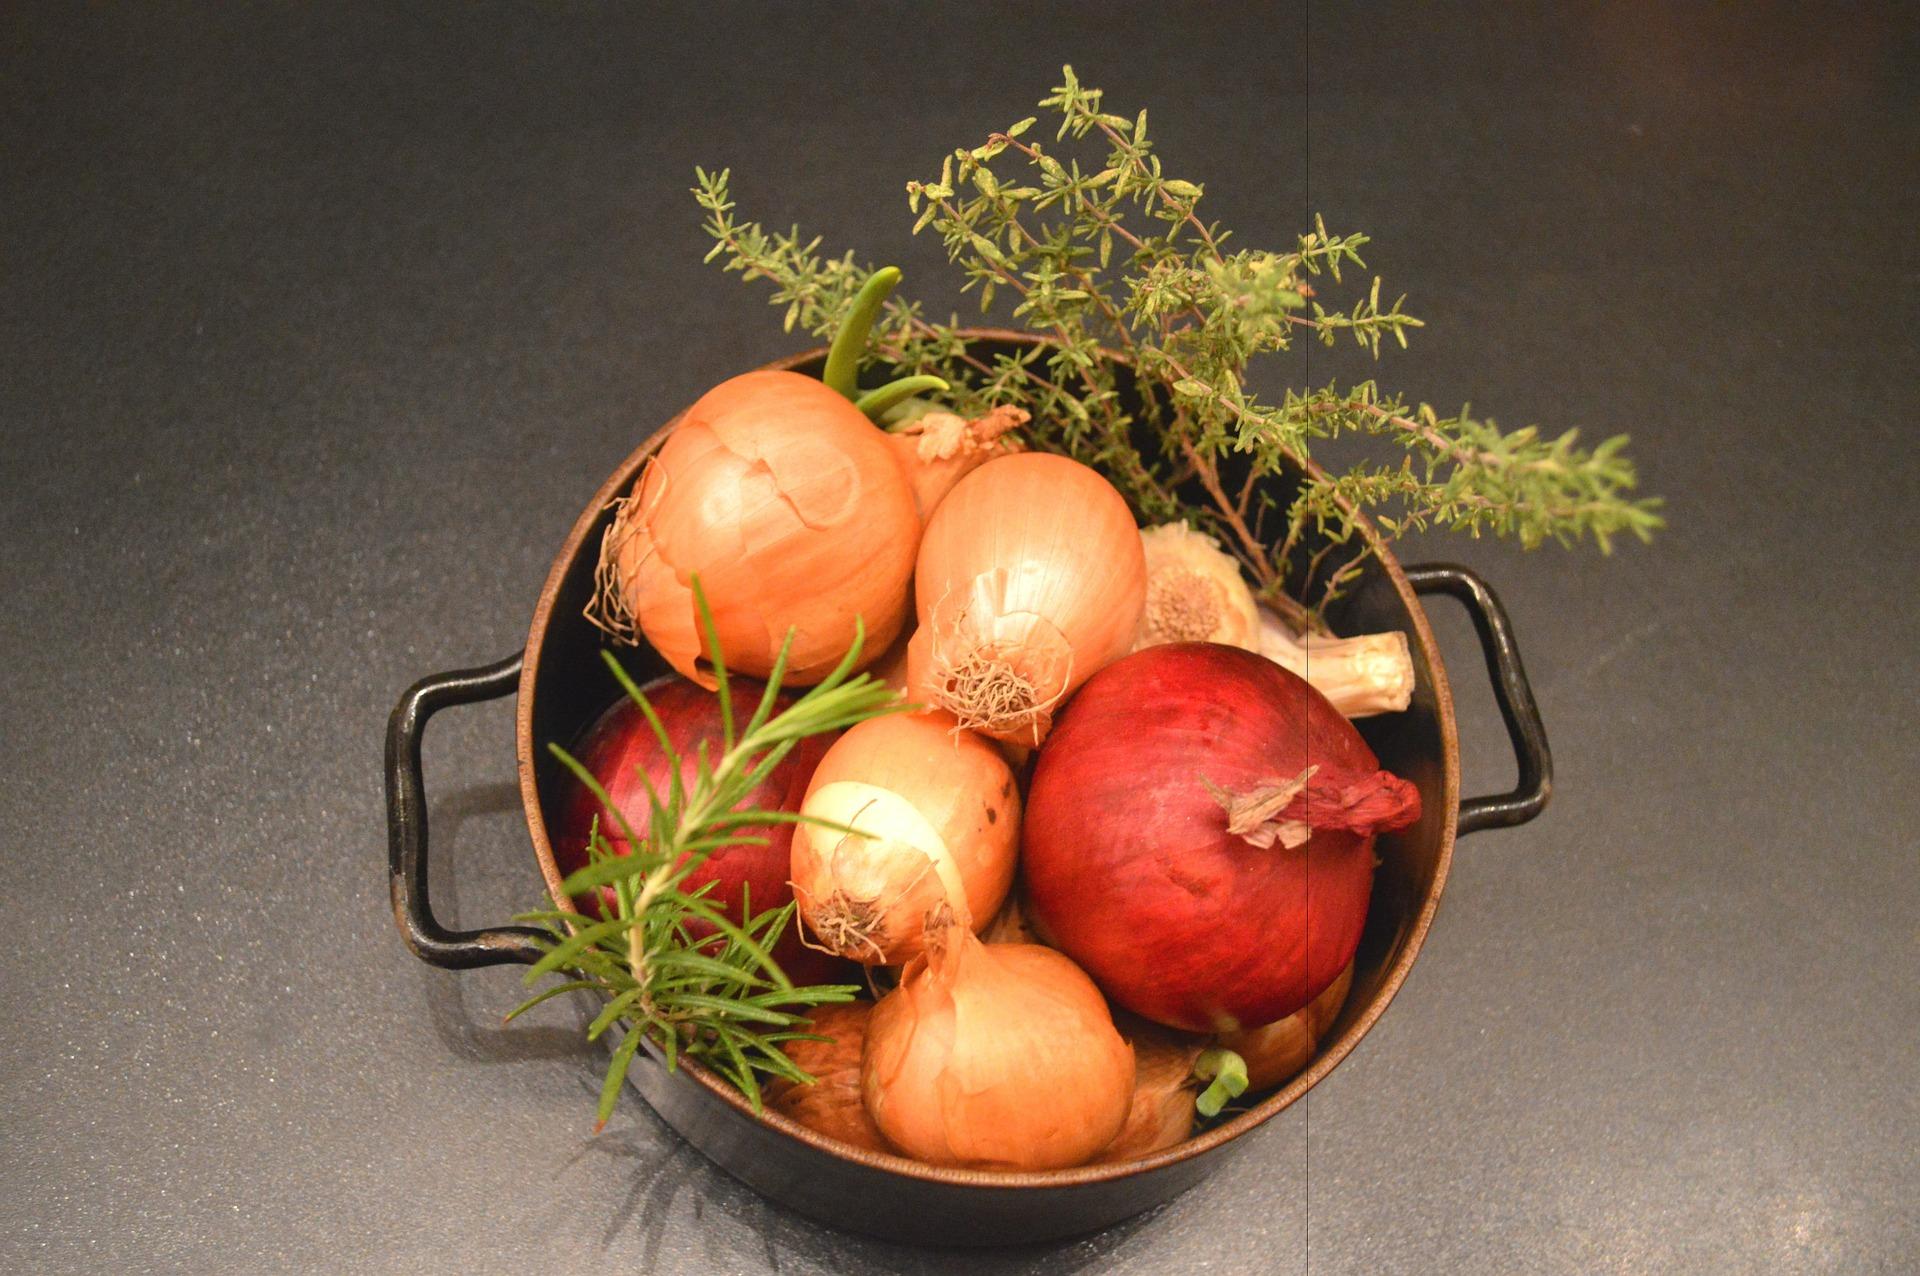 Thyme & Onions | sphaeroid pixabbay.com